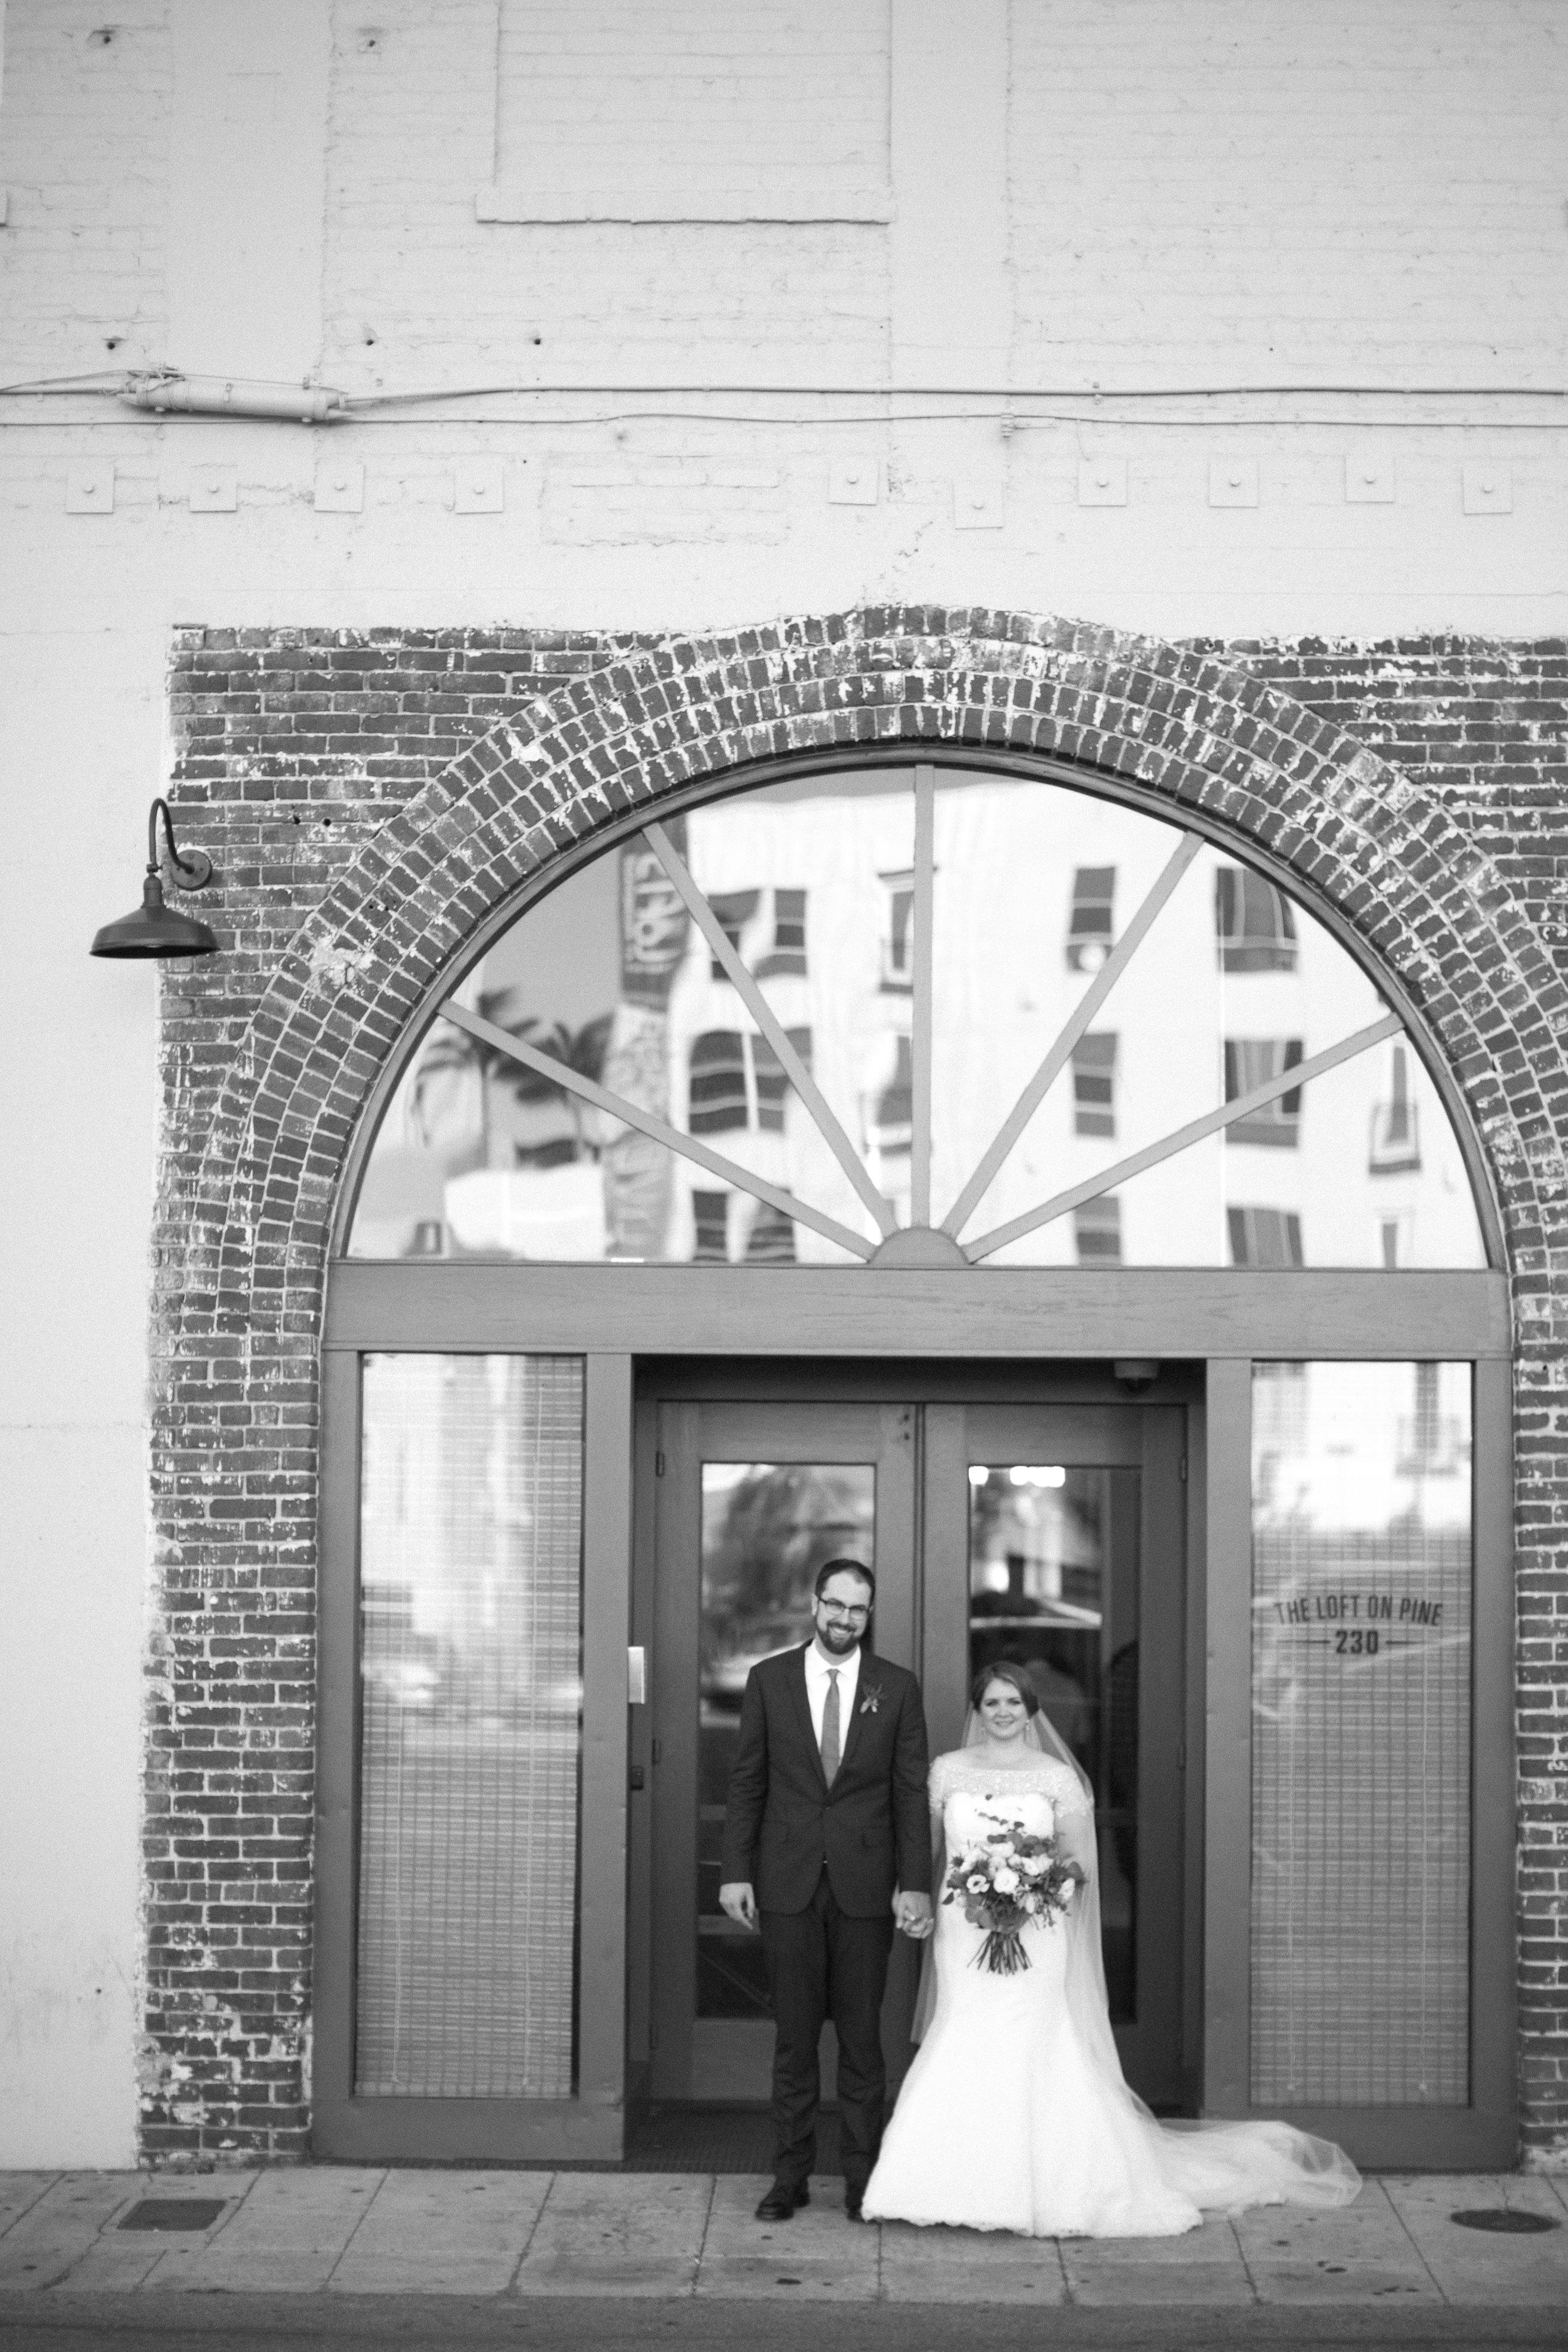 the-loft-on-pine-wedding-14.jpg